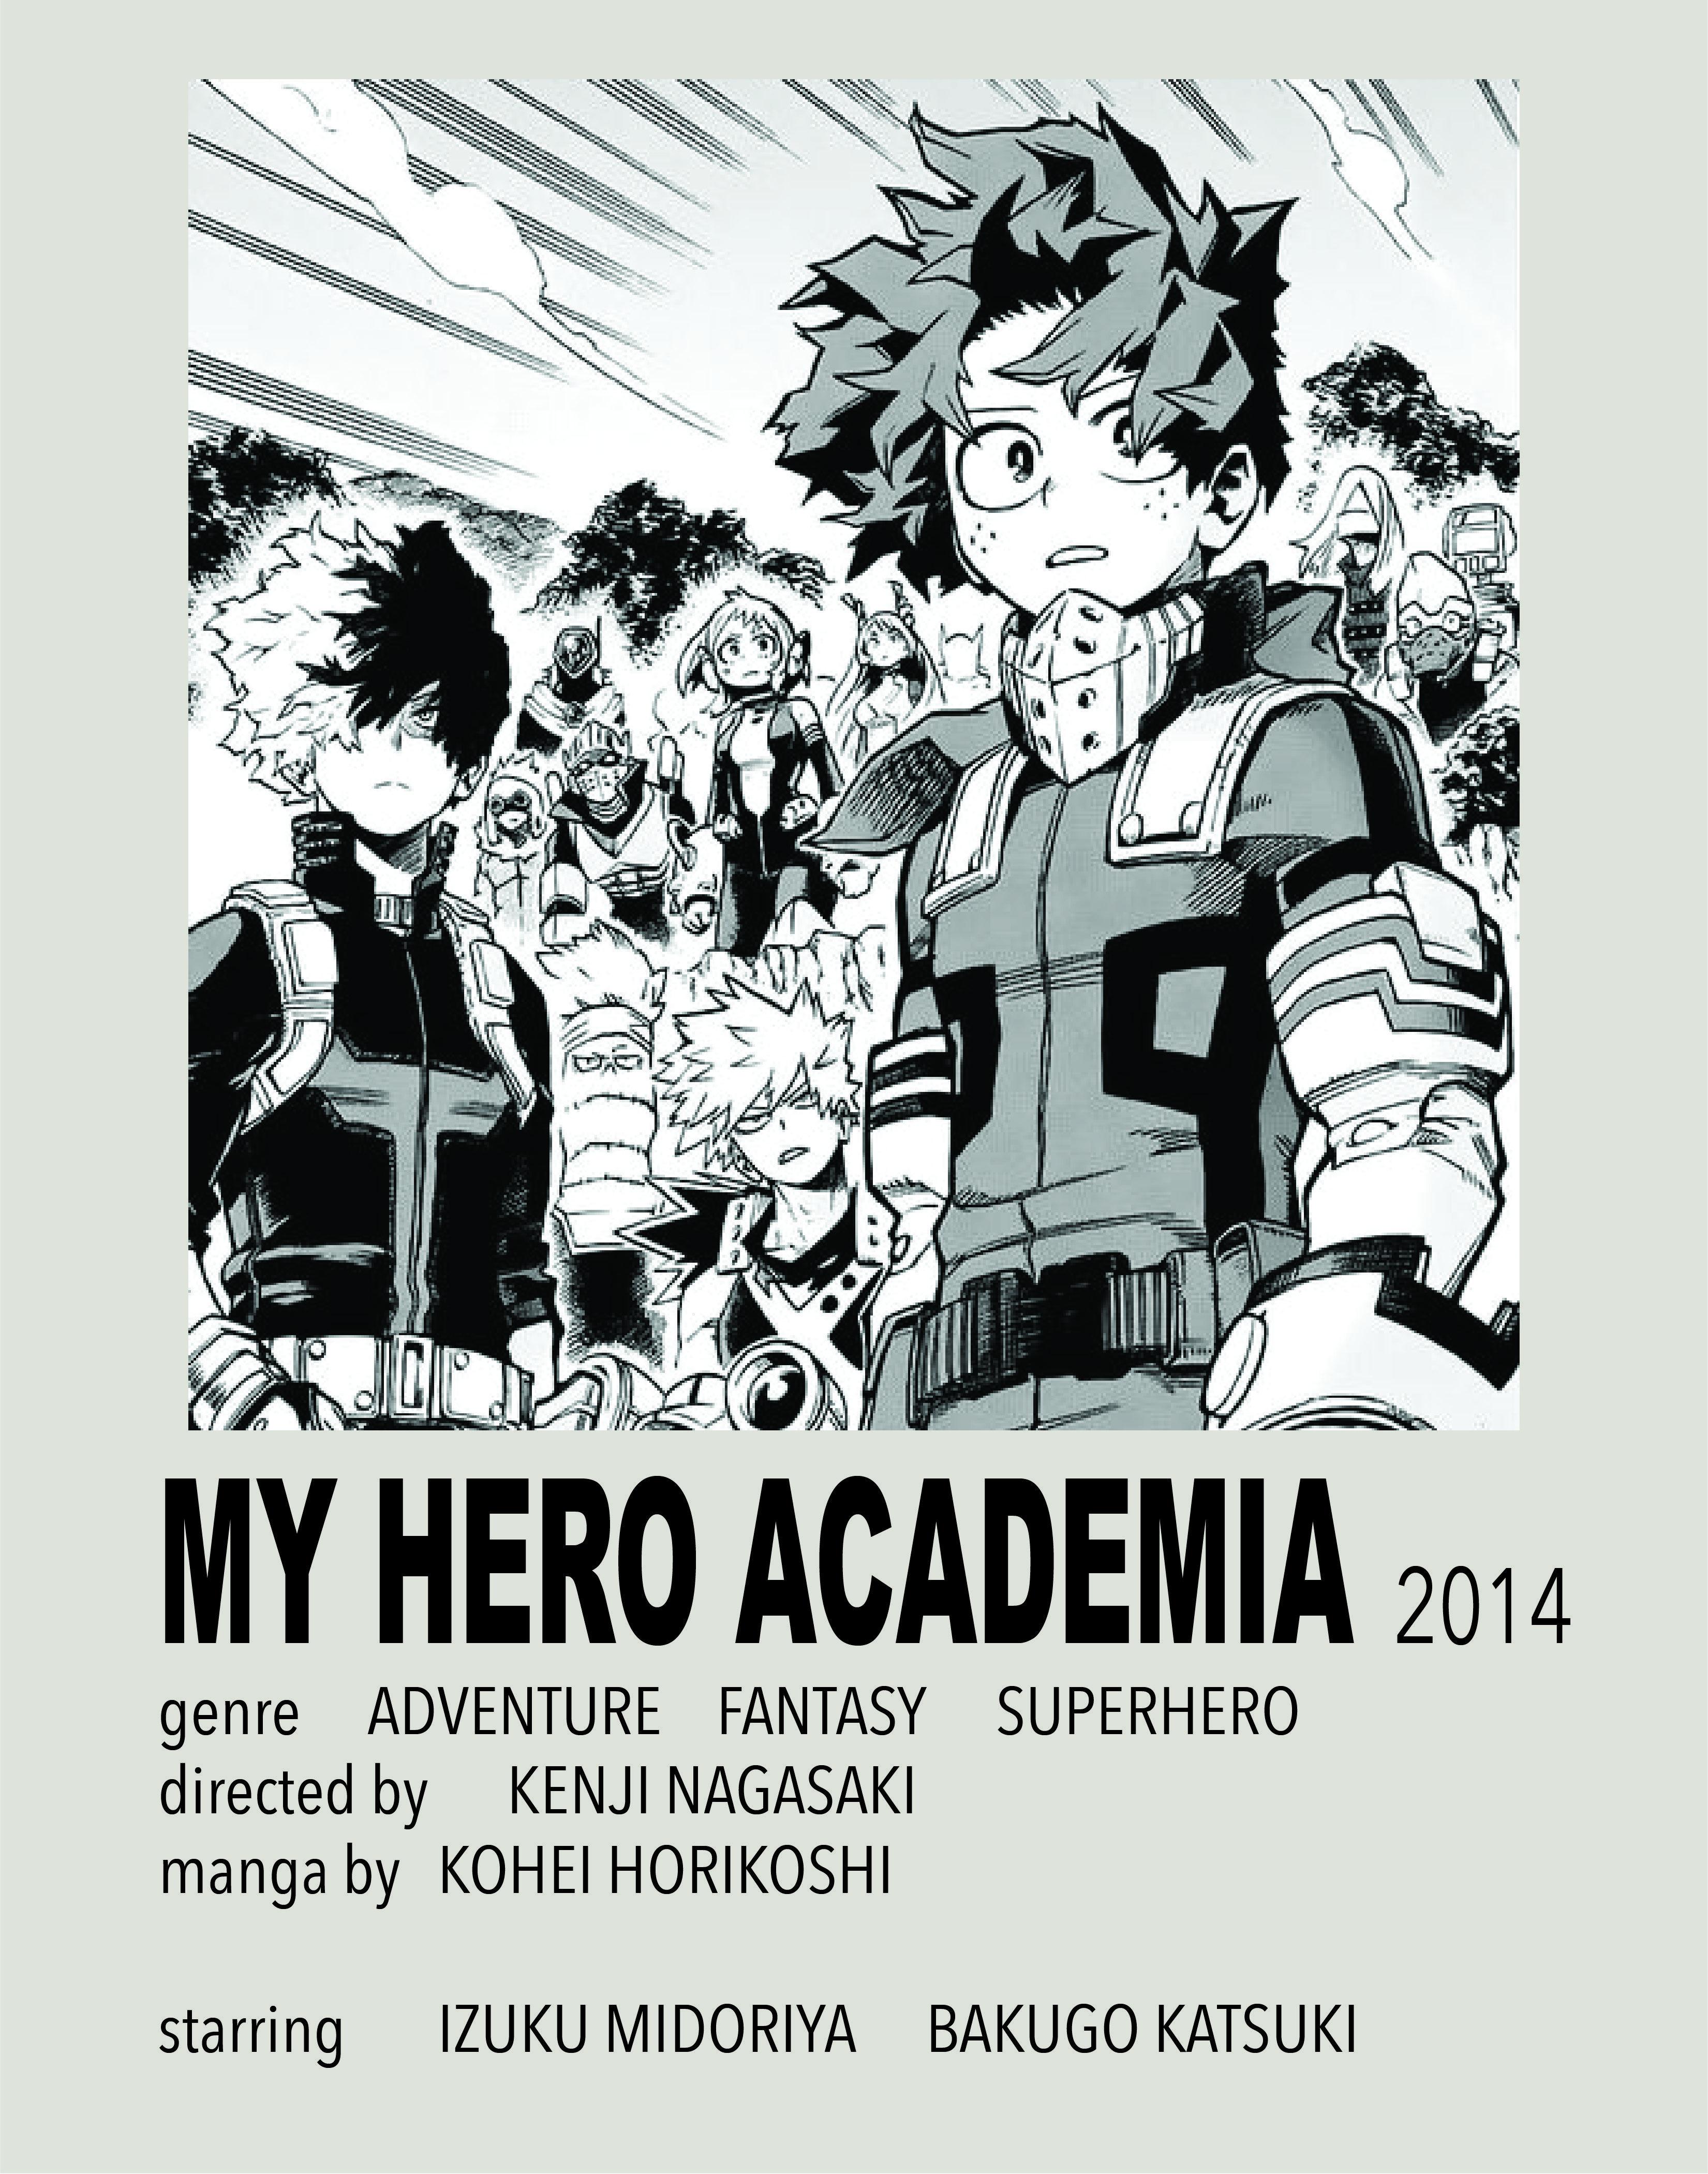 my hero academia polaroid poster by